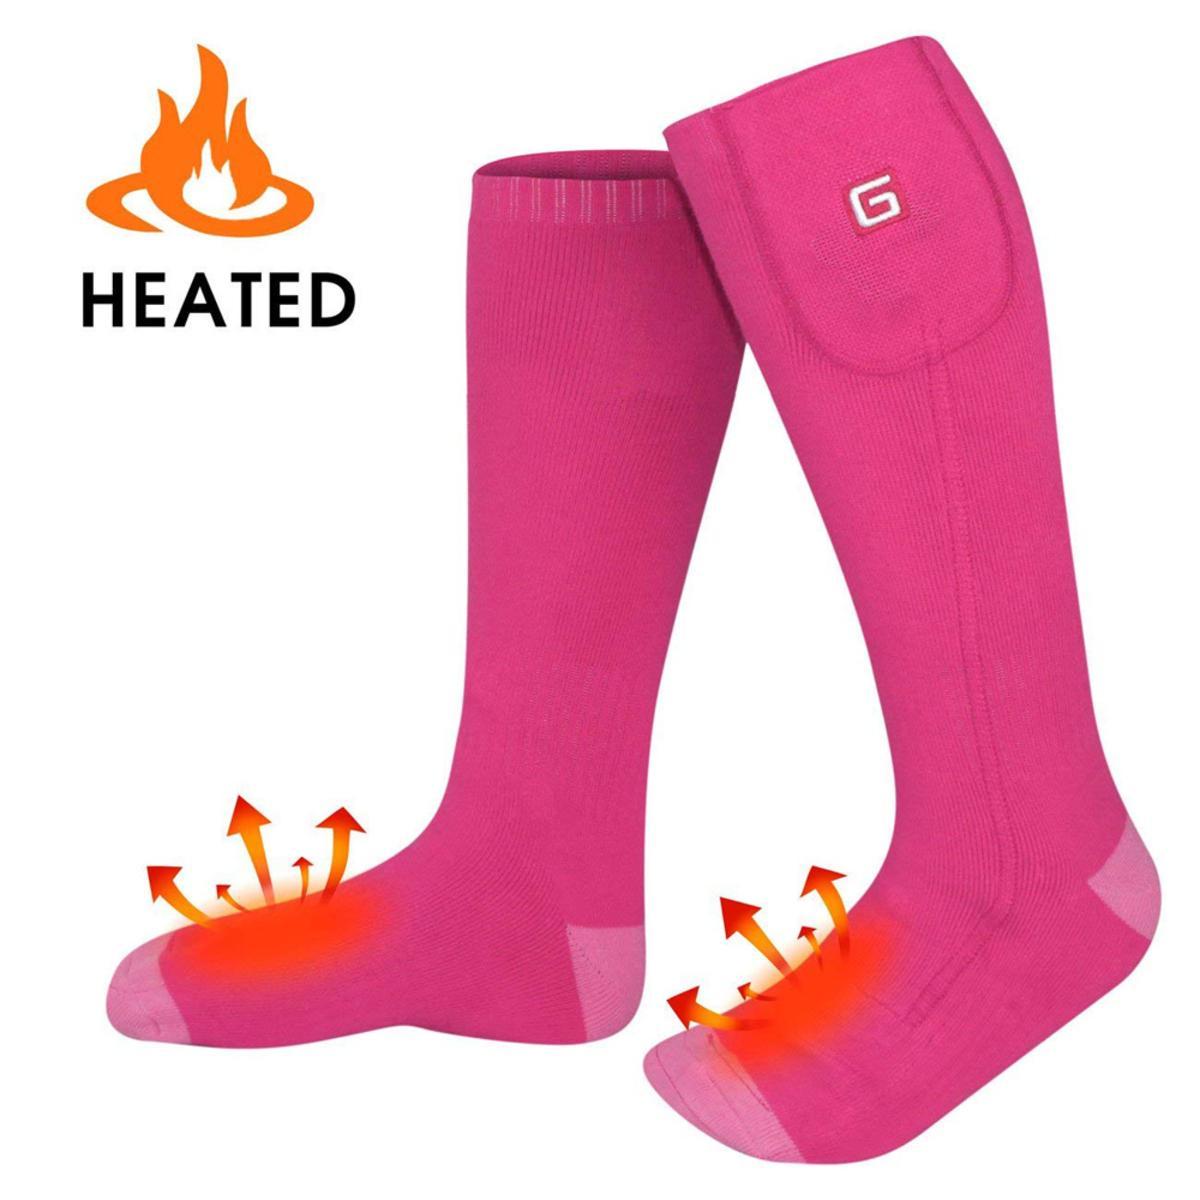 Global Vasion 3.7V Electric Warm Heated Socks for ...